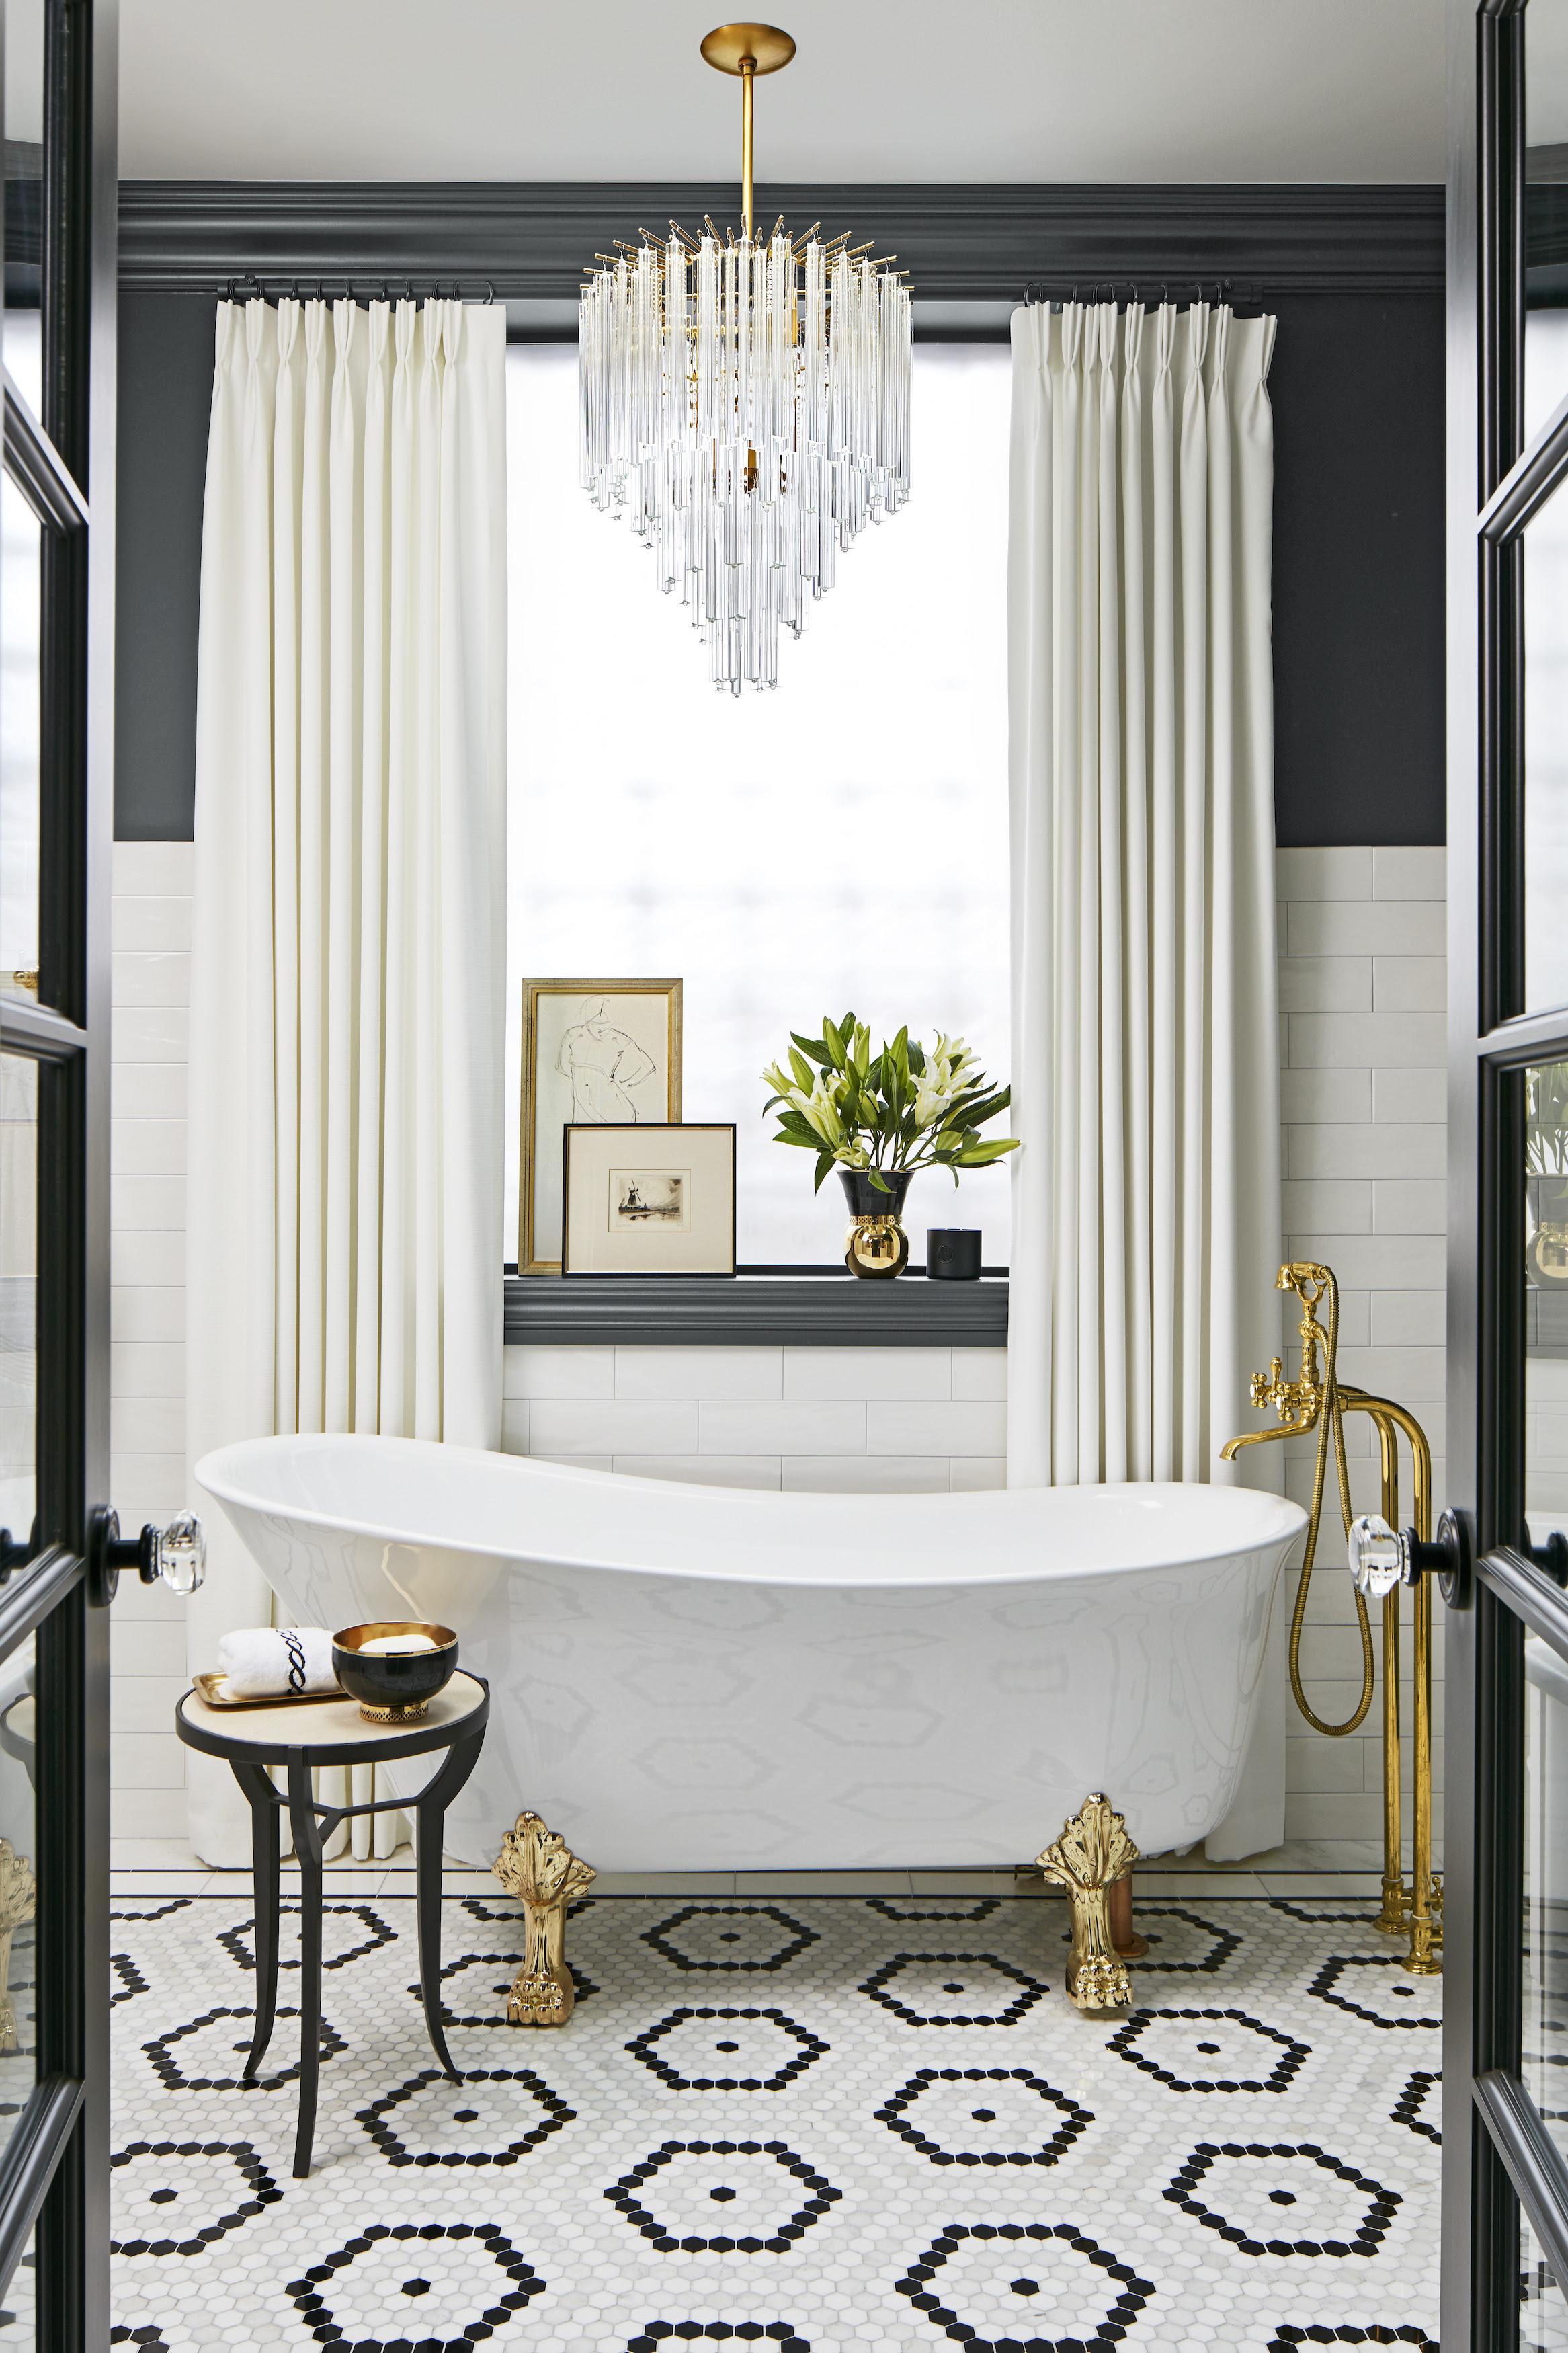 12 Best Bathroom Paint Colors Popular Ideas for Bathroom Wall Colors